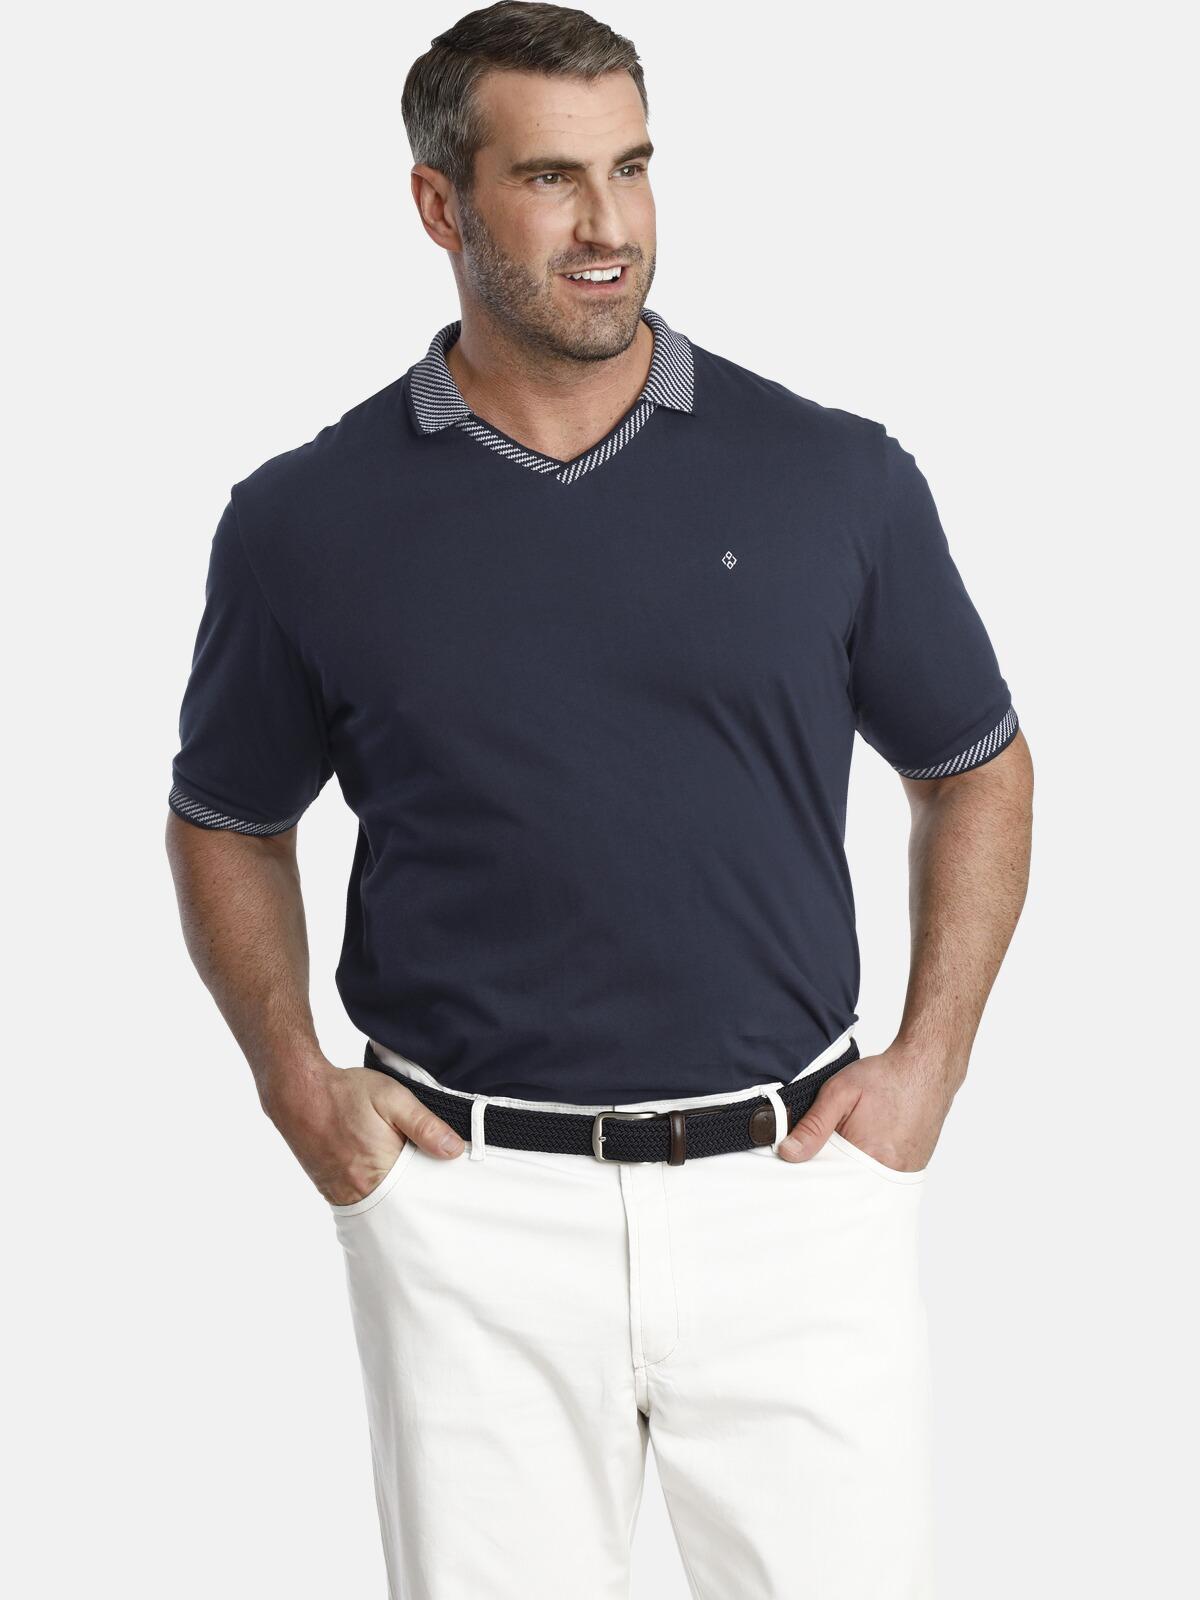 charles colby -  V-Shirt EARL GOLO, mit gestricktem V-Ausschnitt